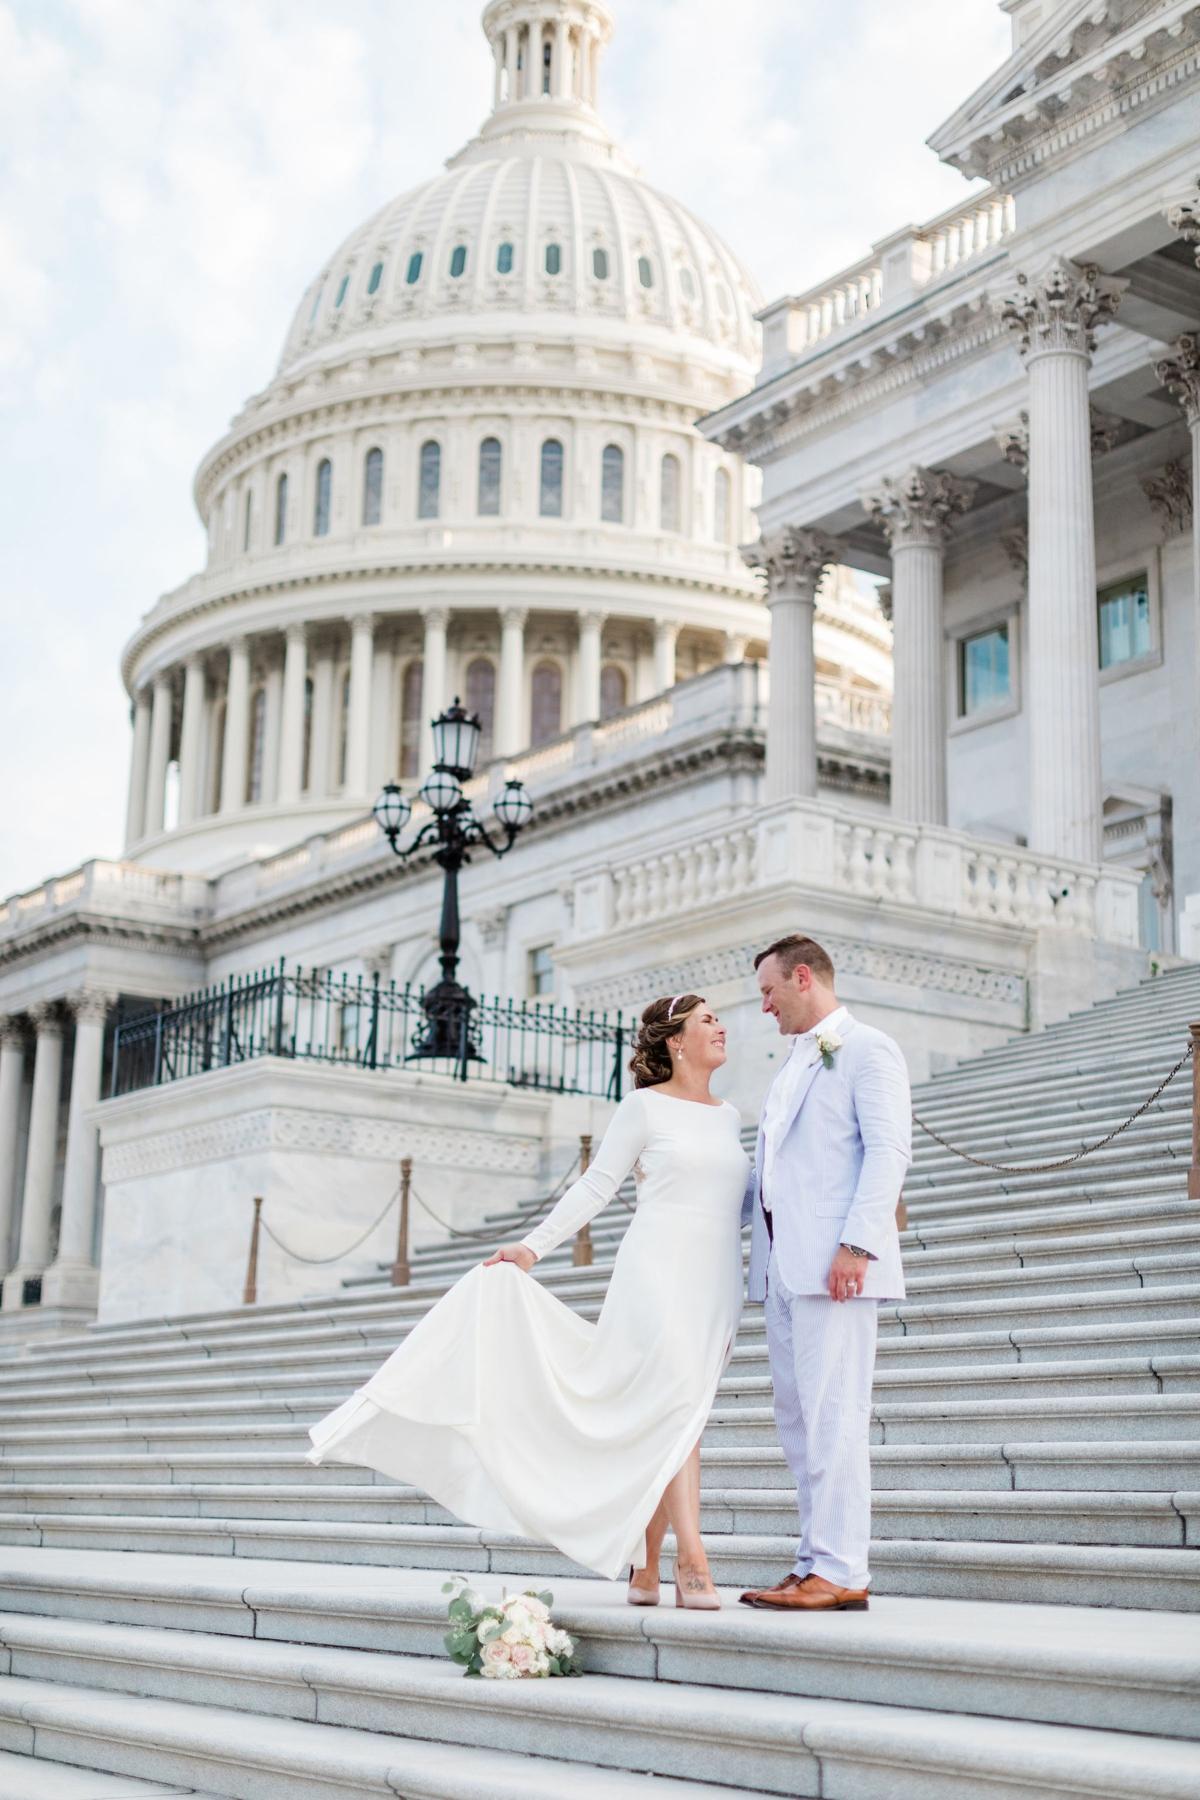 Catie + Carl's Intimate Washington DC Wedding by Apt. B Photography